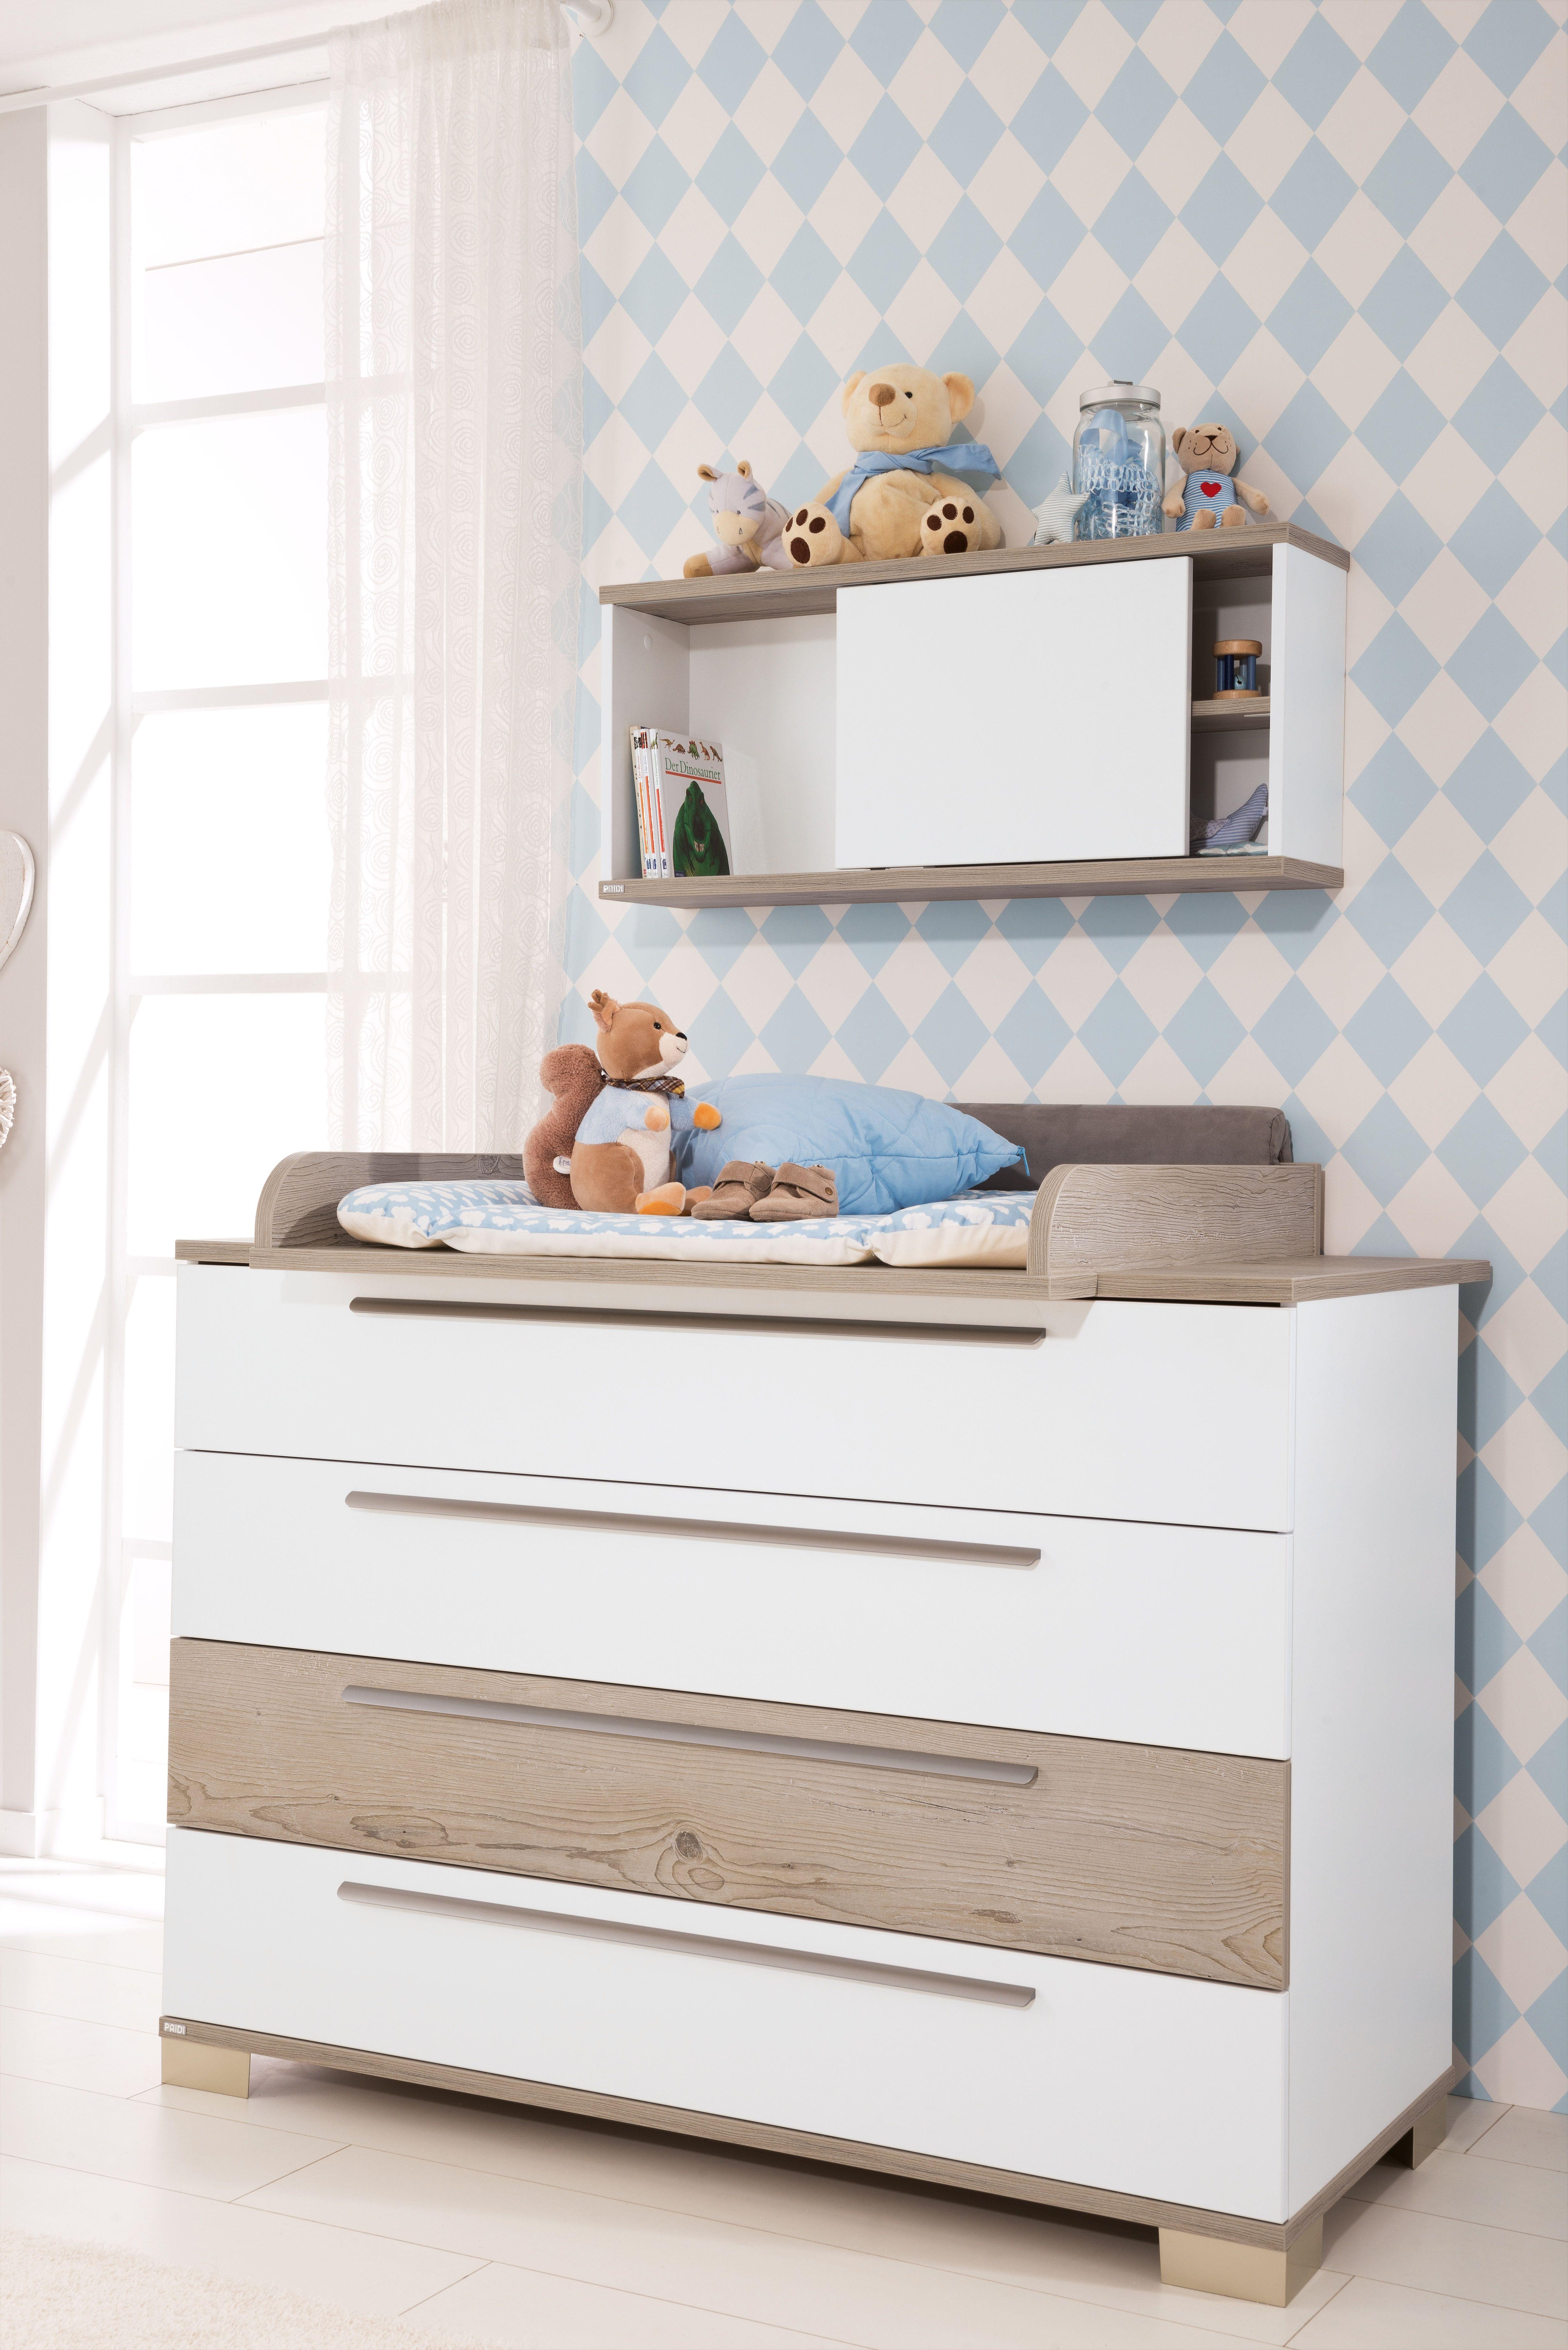 Babyrooms Home interior design, Home decor, Room